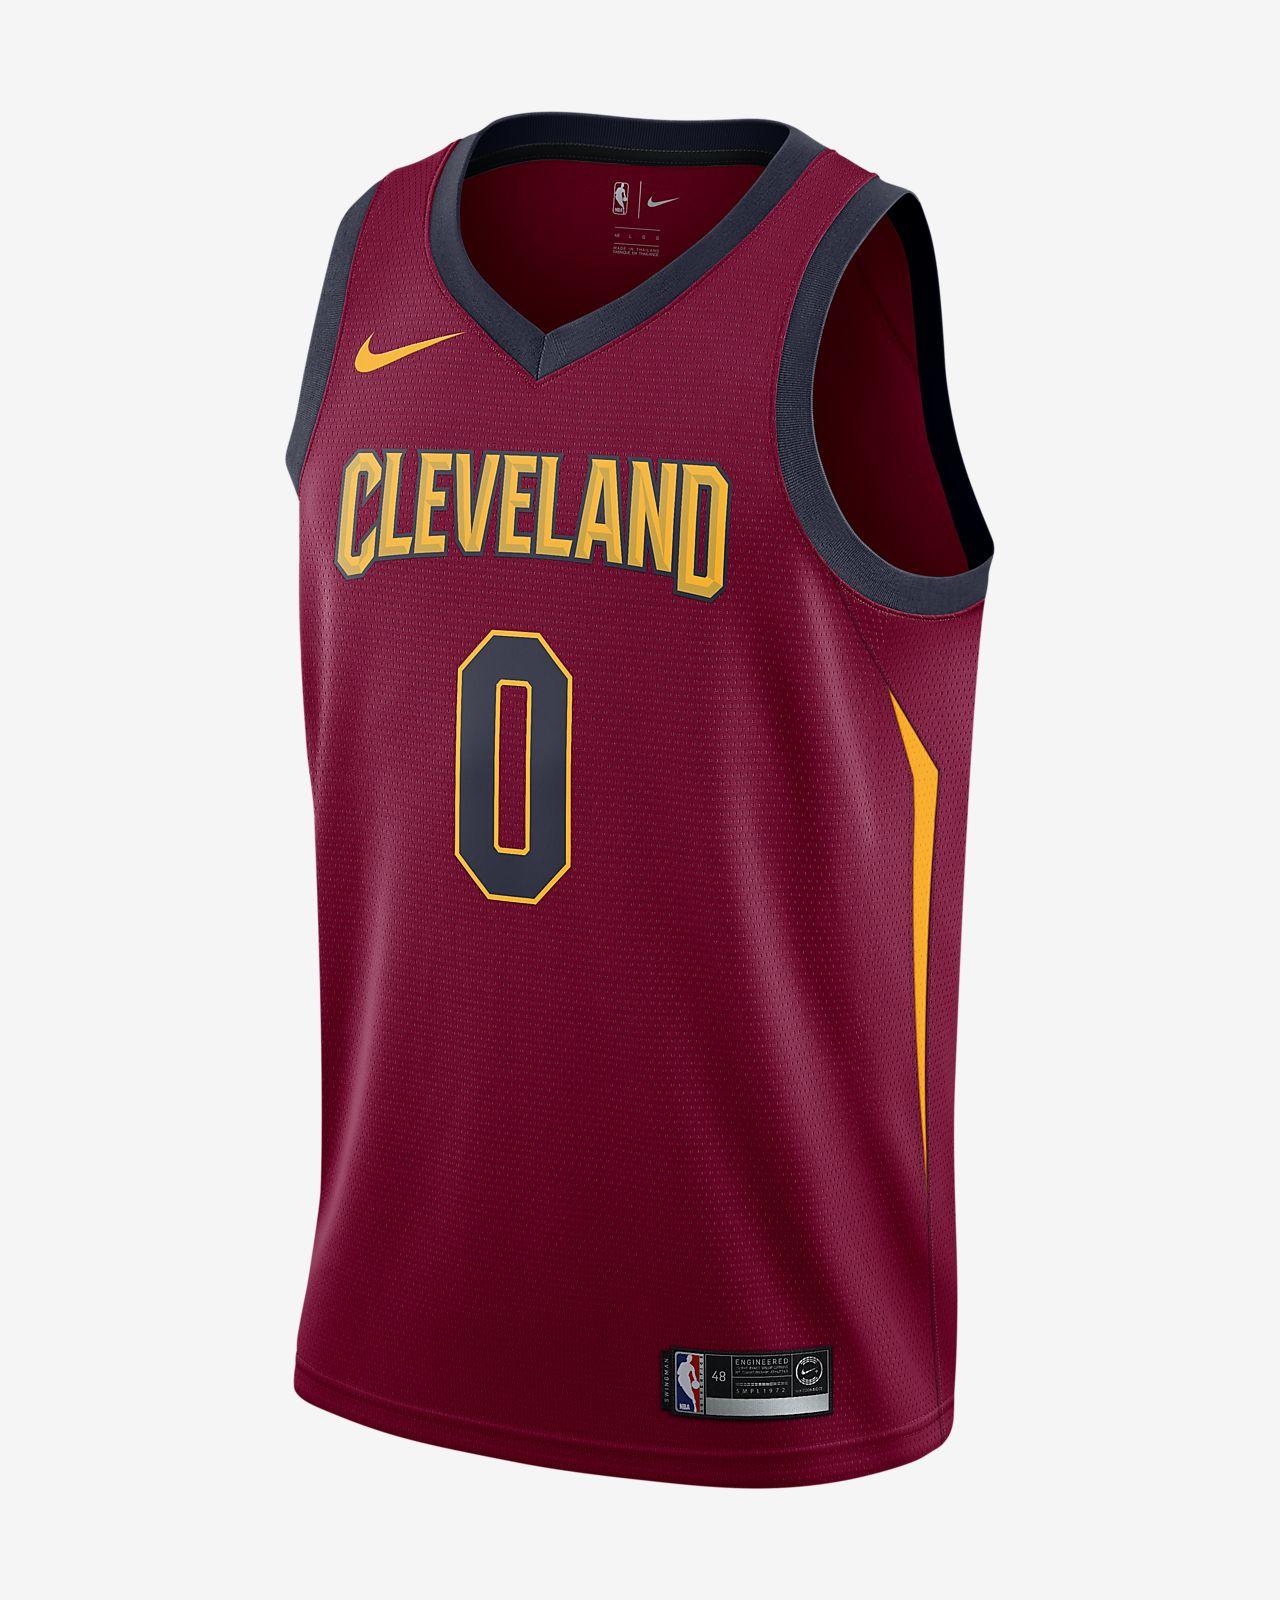 Męska koszulka Nike NBA Connected Jersey Kevin Love Icon Edition Swingman Jersey (Cleveland Cavaliers)